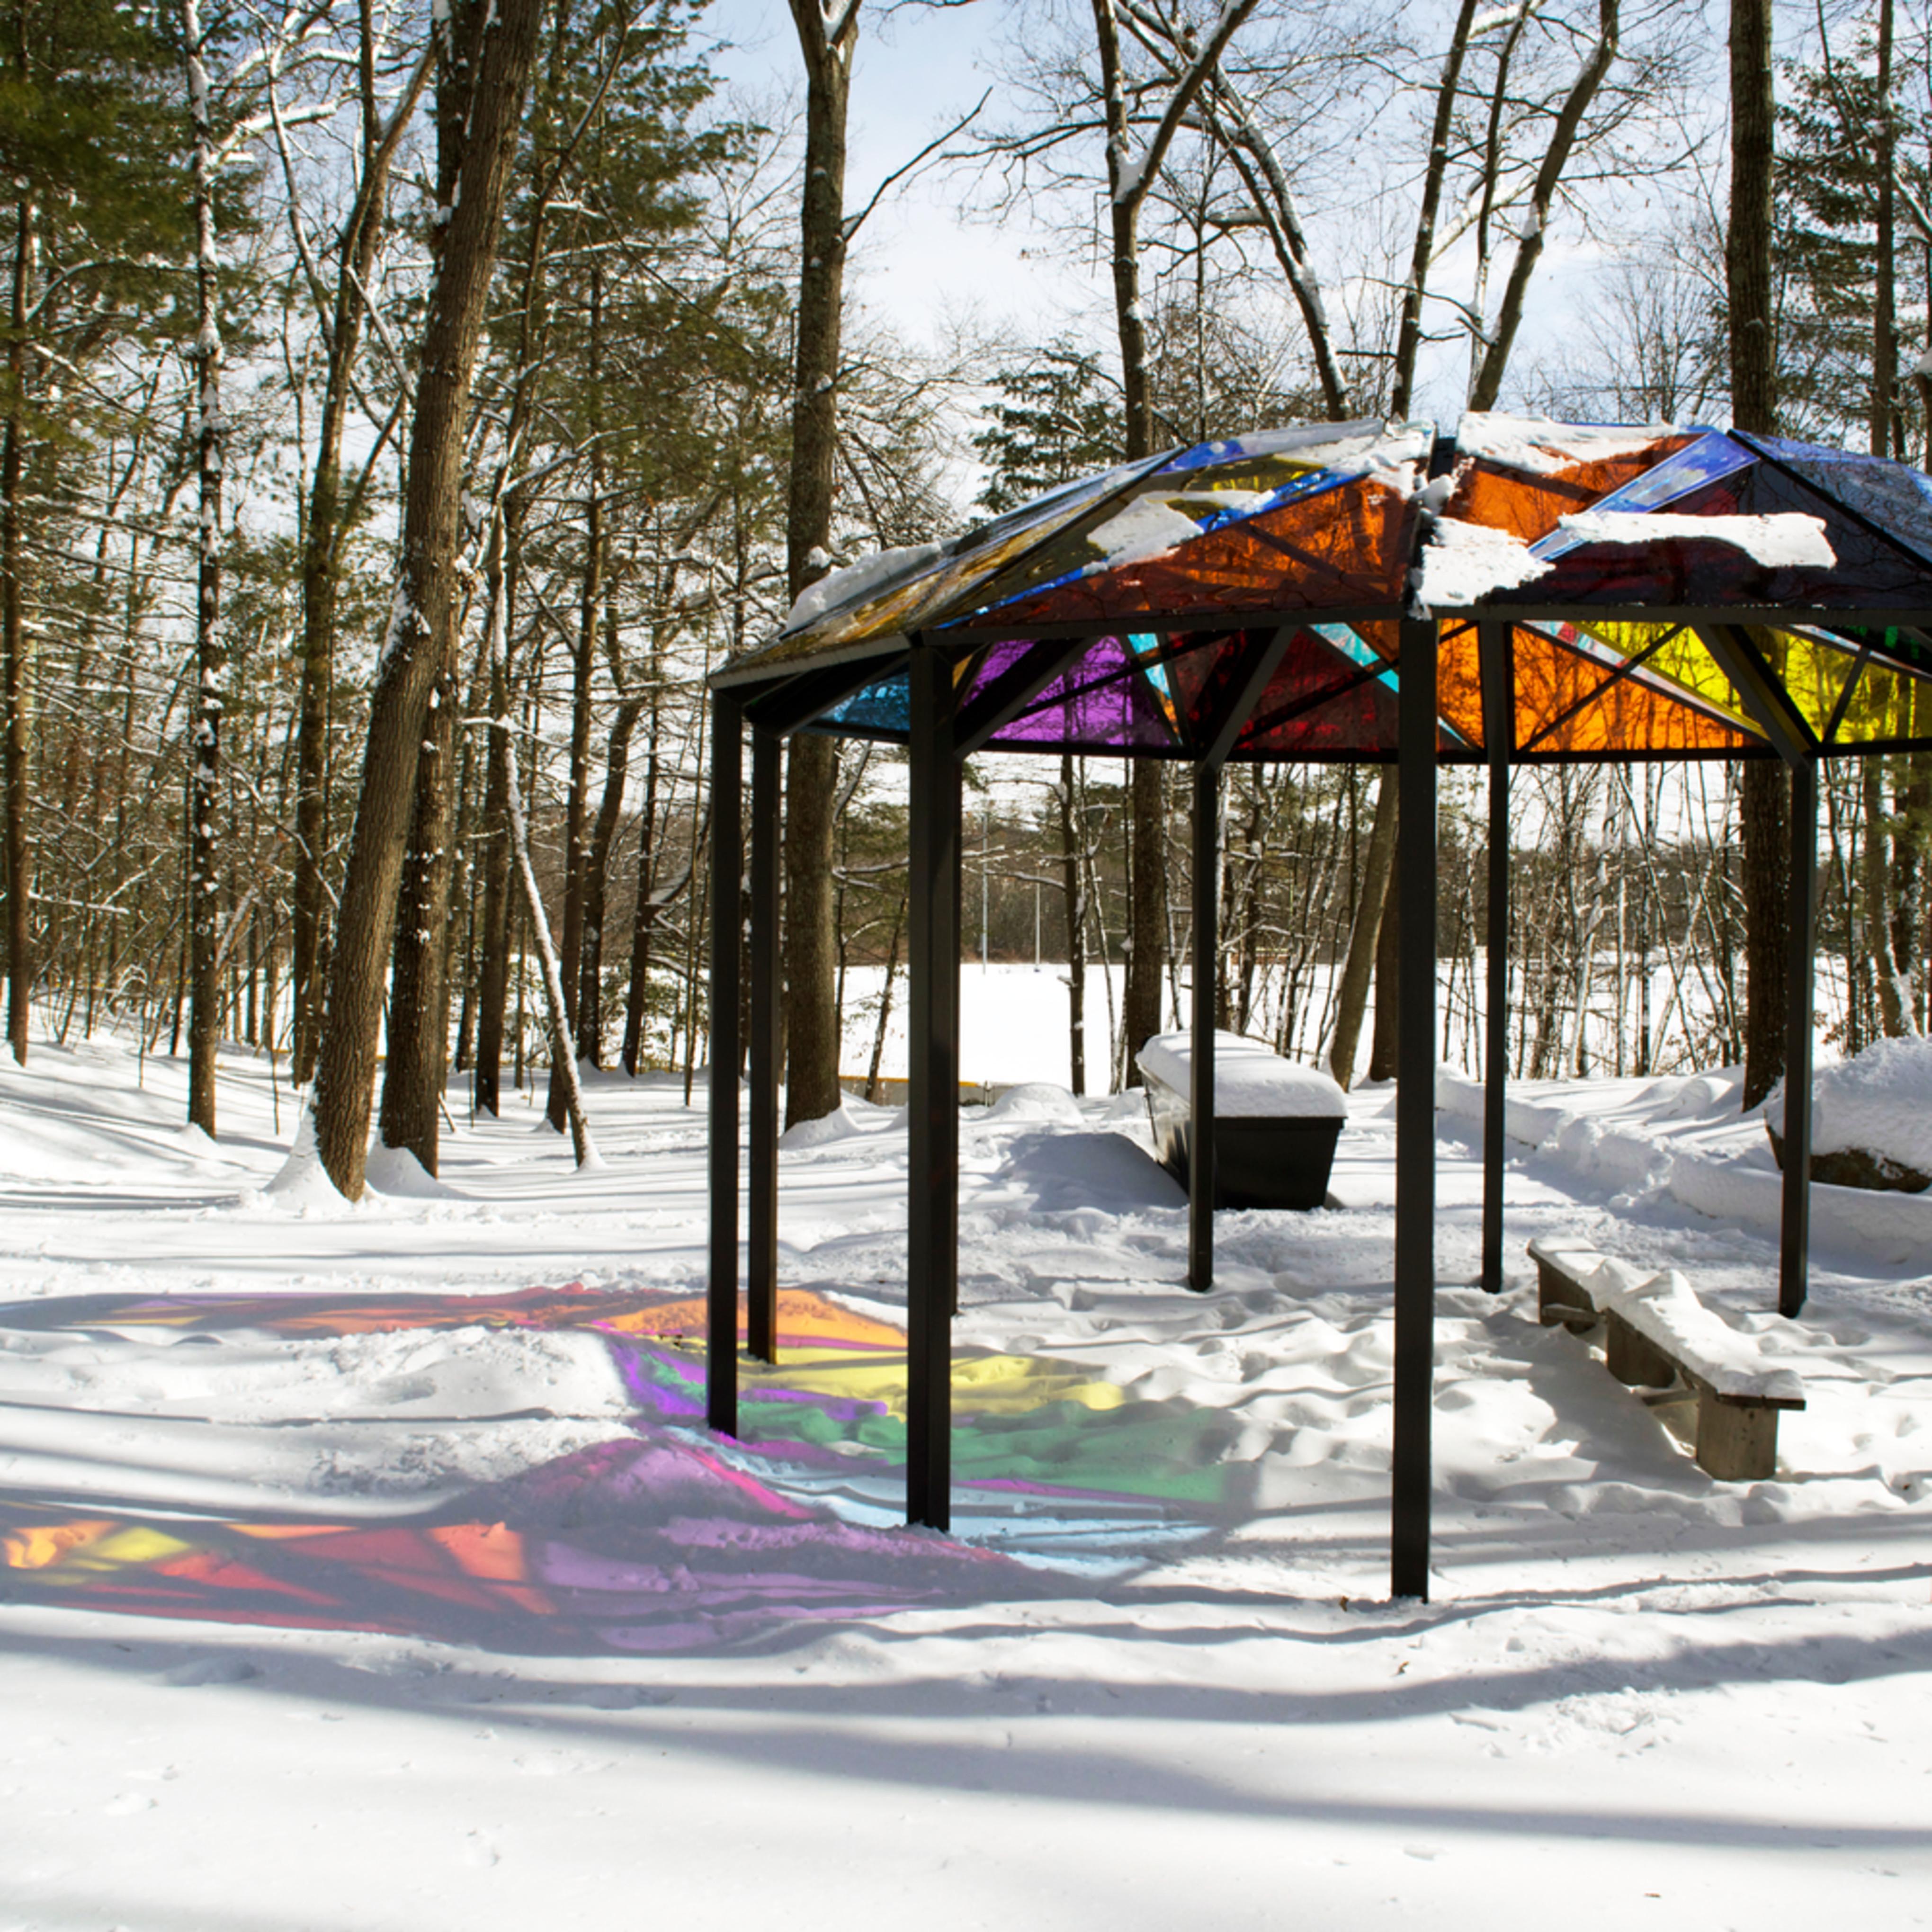 Borelli ashland garden winter 2017 wvqghe